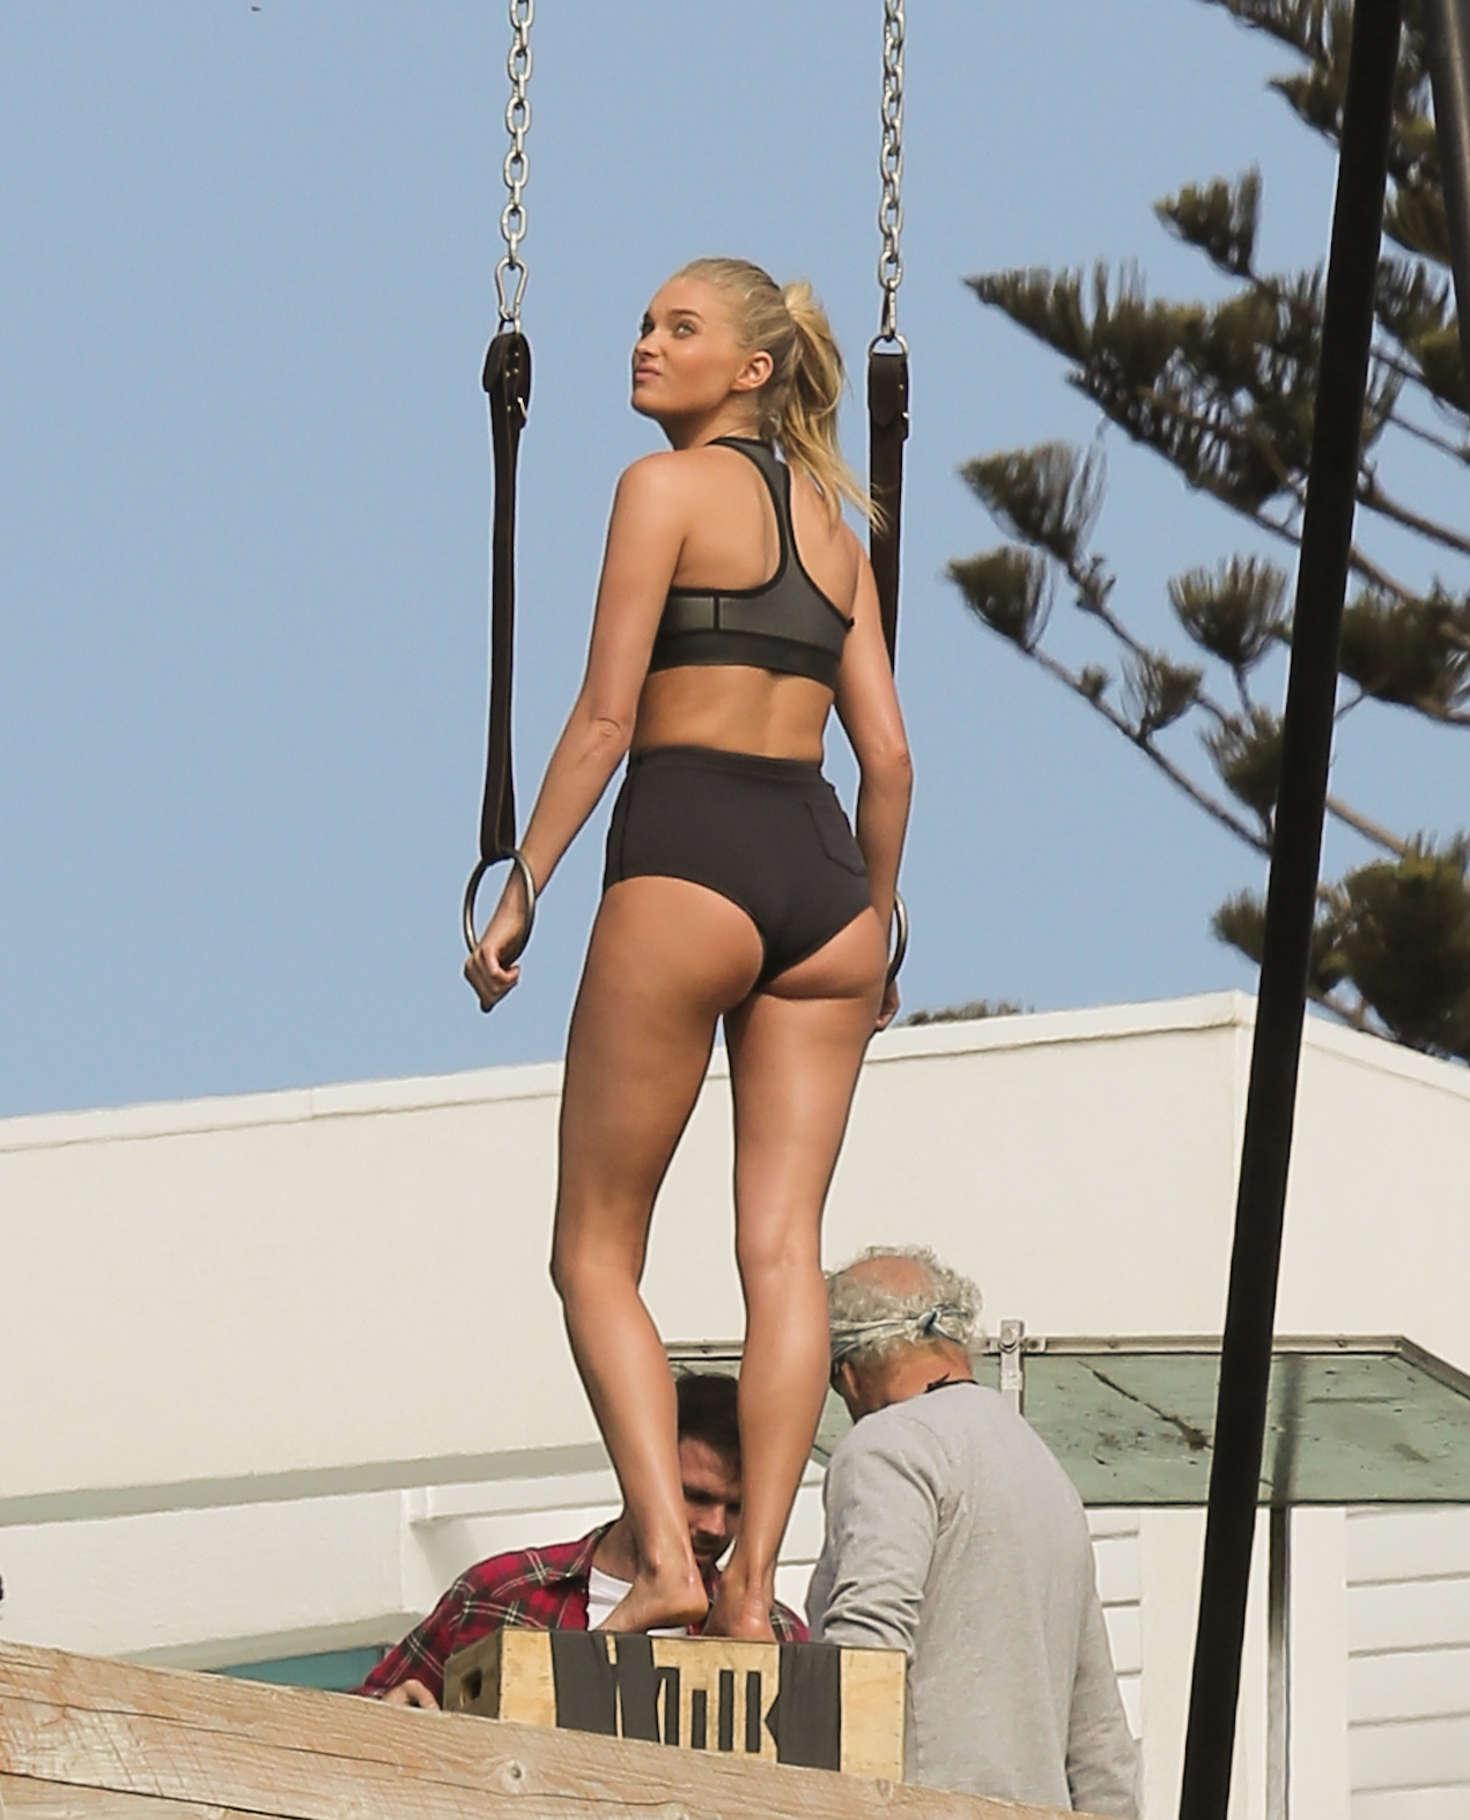 Elsa hosk posing in a bikini malibu nudes (78 pics)